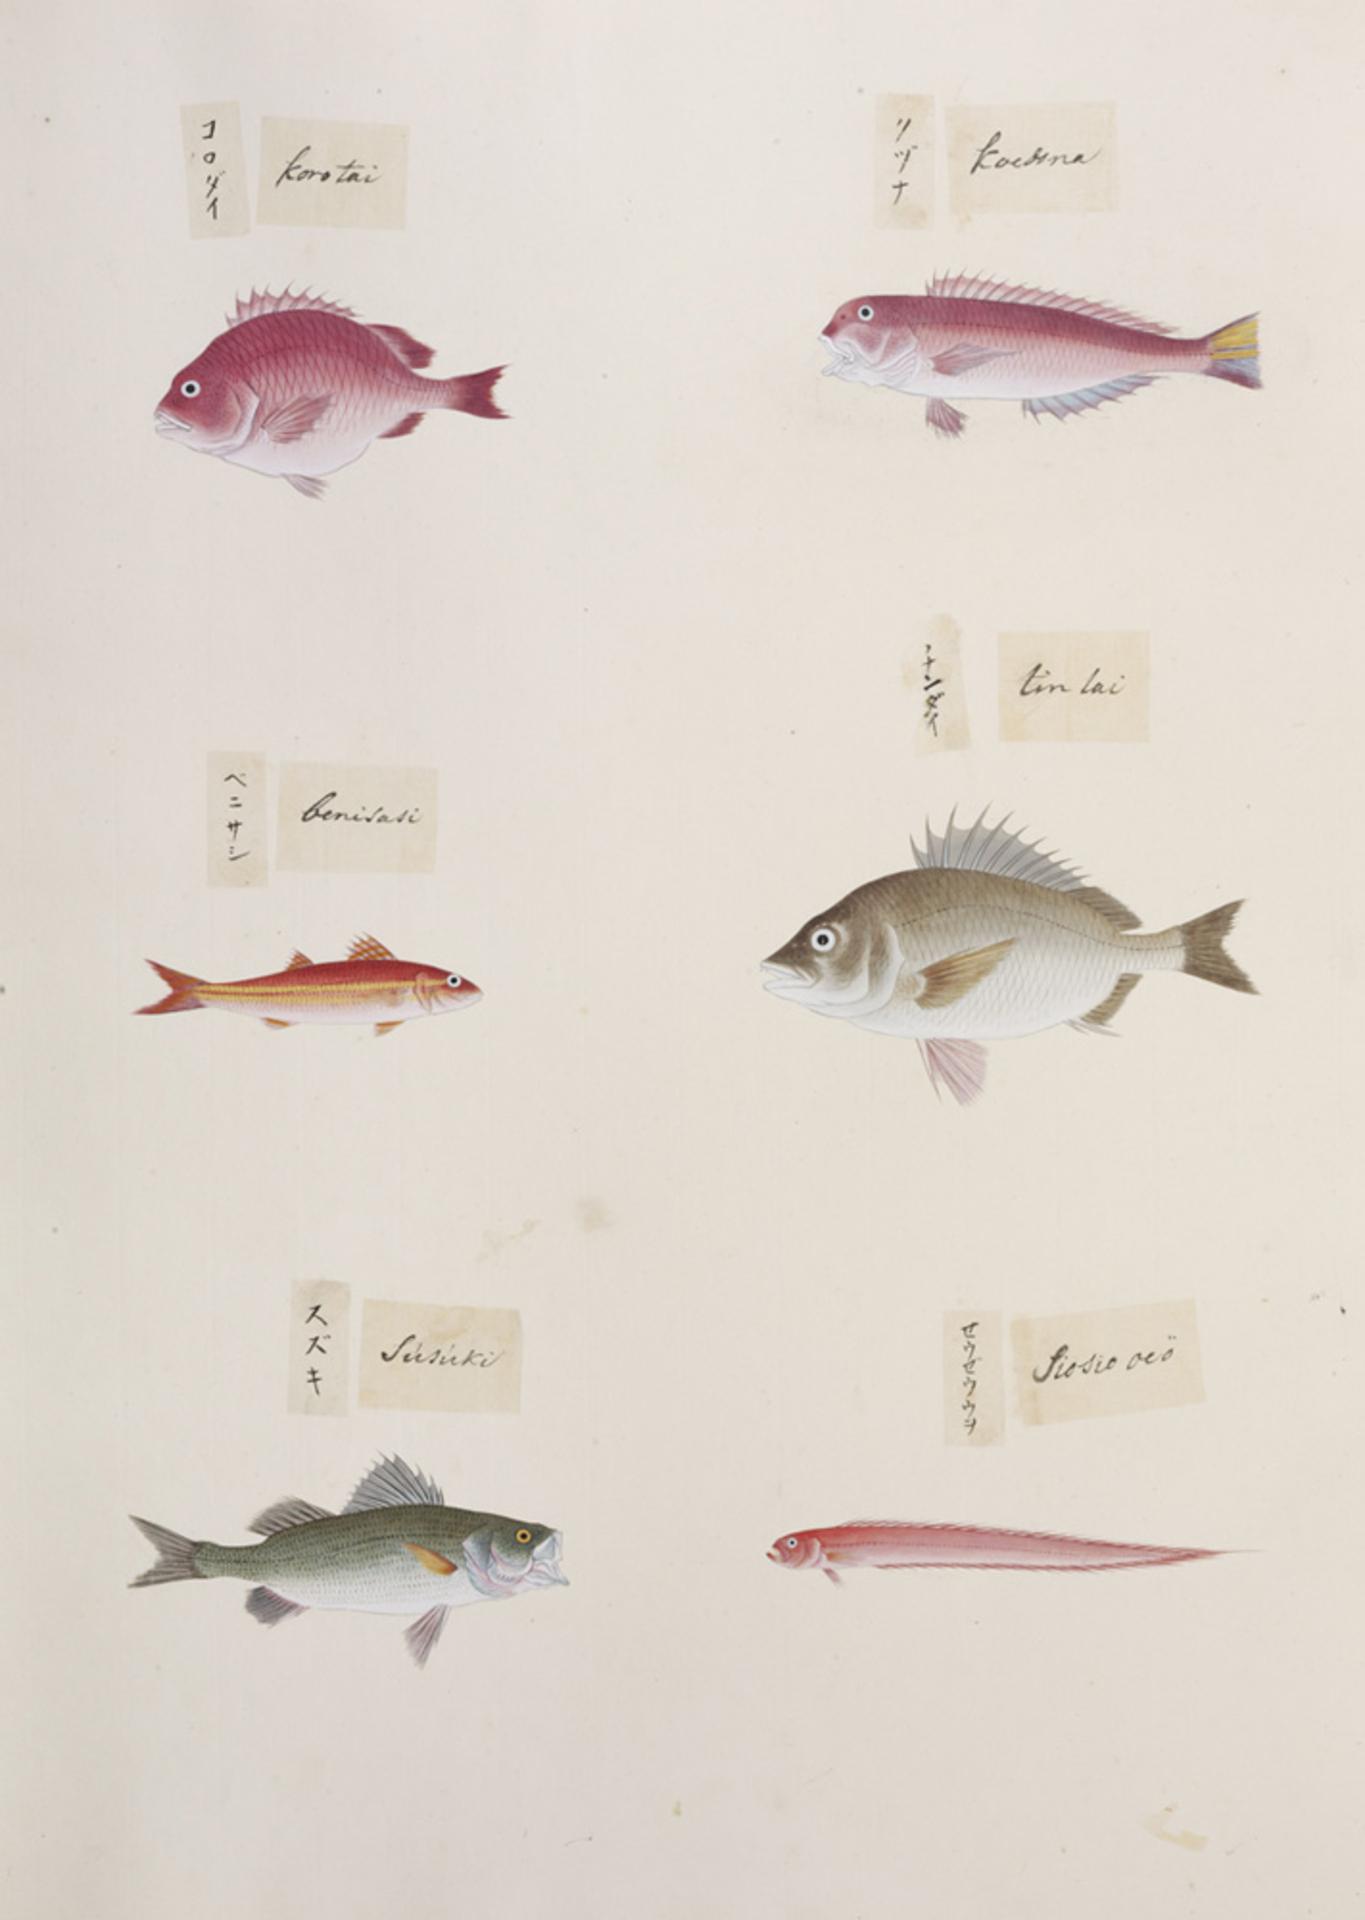 RMNH.ART.316 | Lateolabrax japonicus